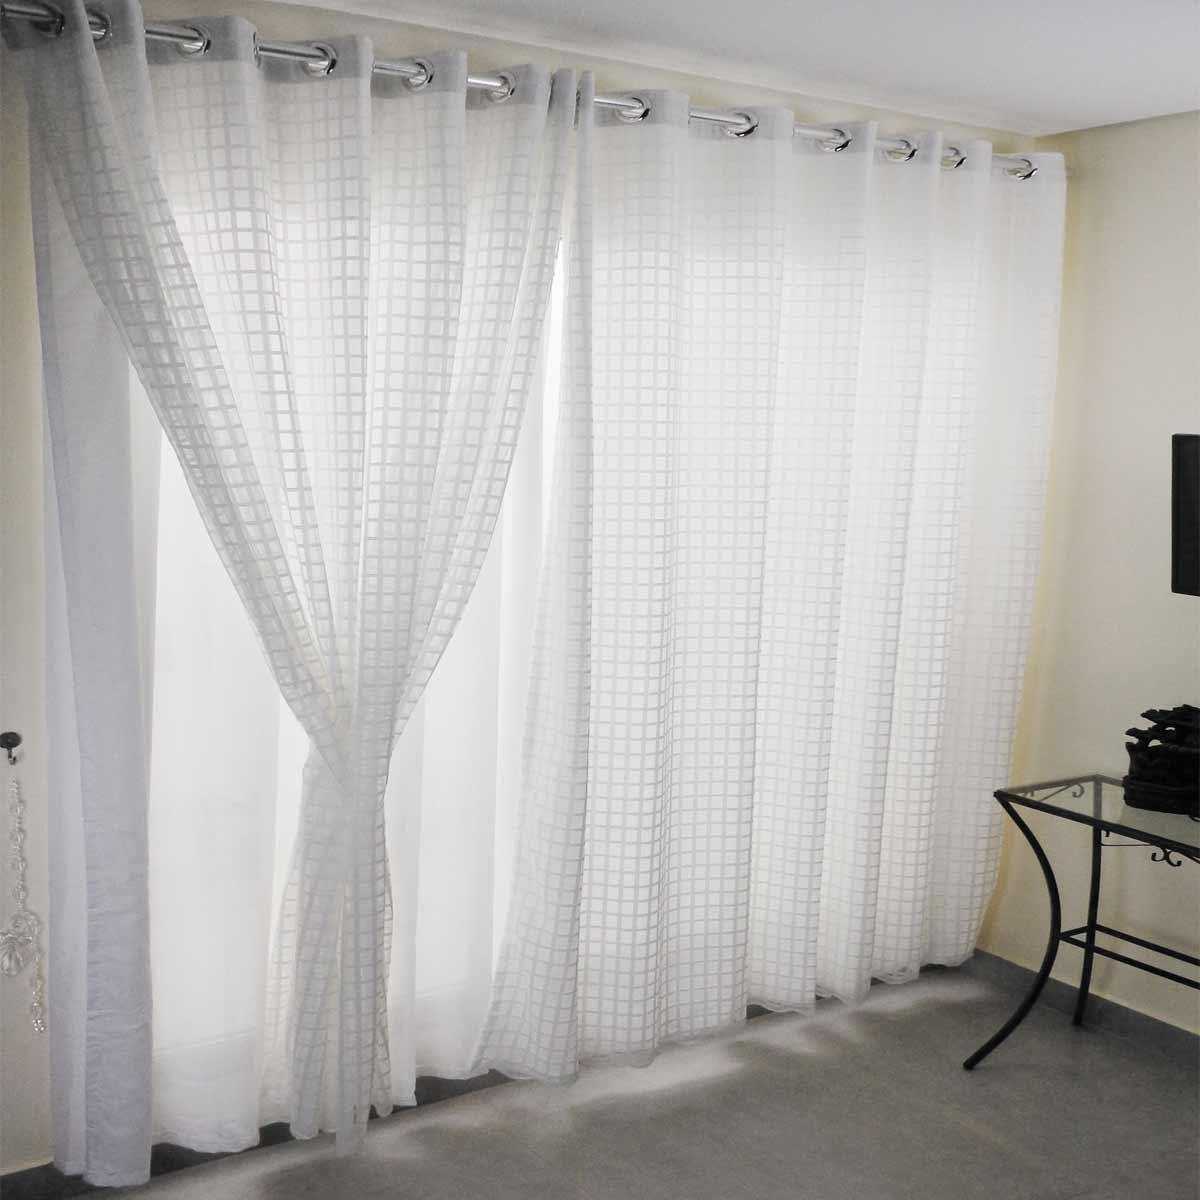 Cortina Duplex 4.20m x 2.50m Vintage / Xadrez Branco Bella Janela